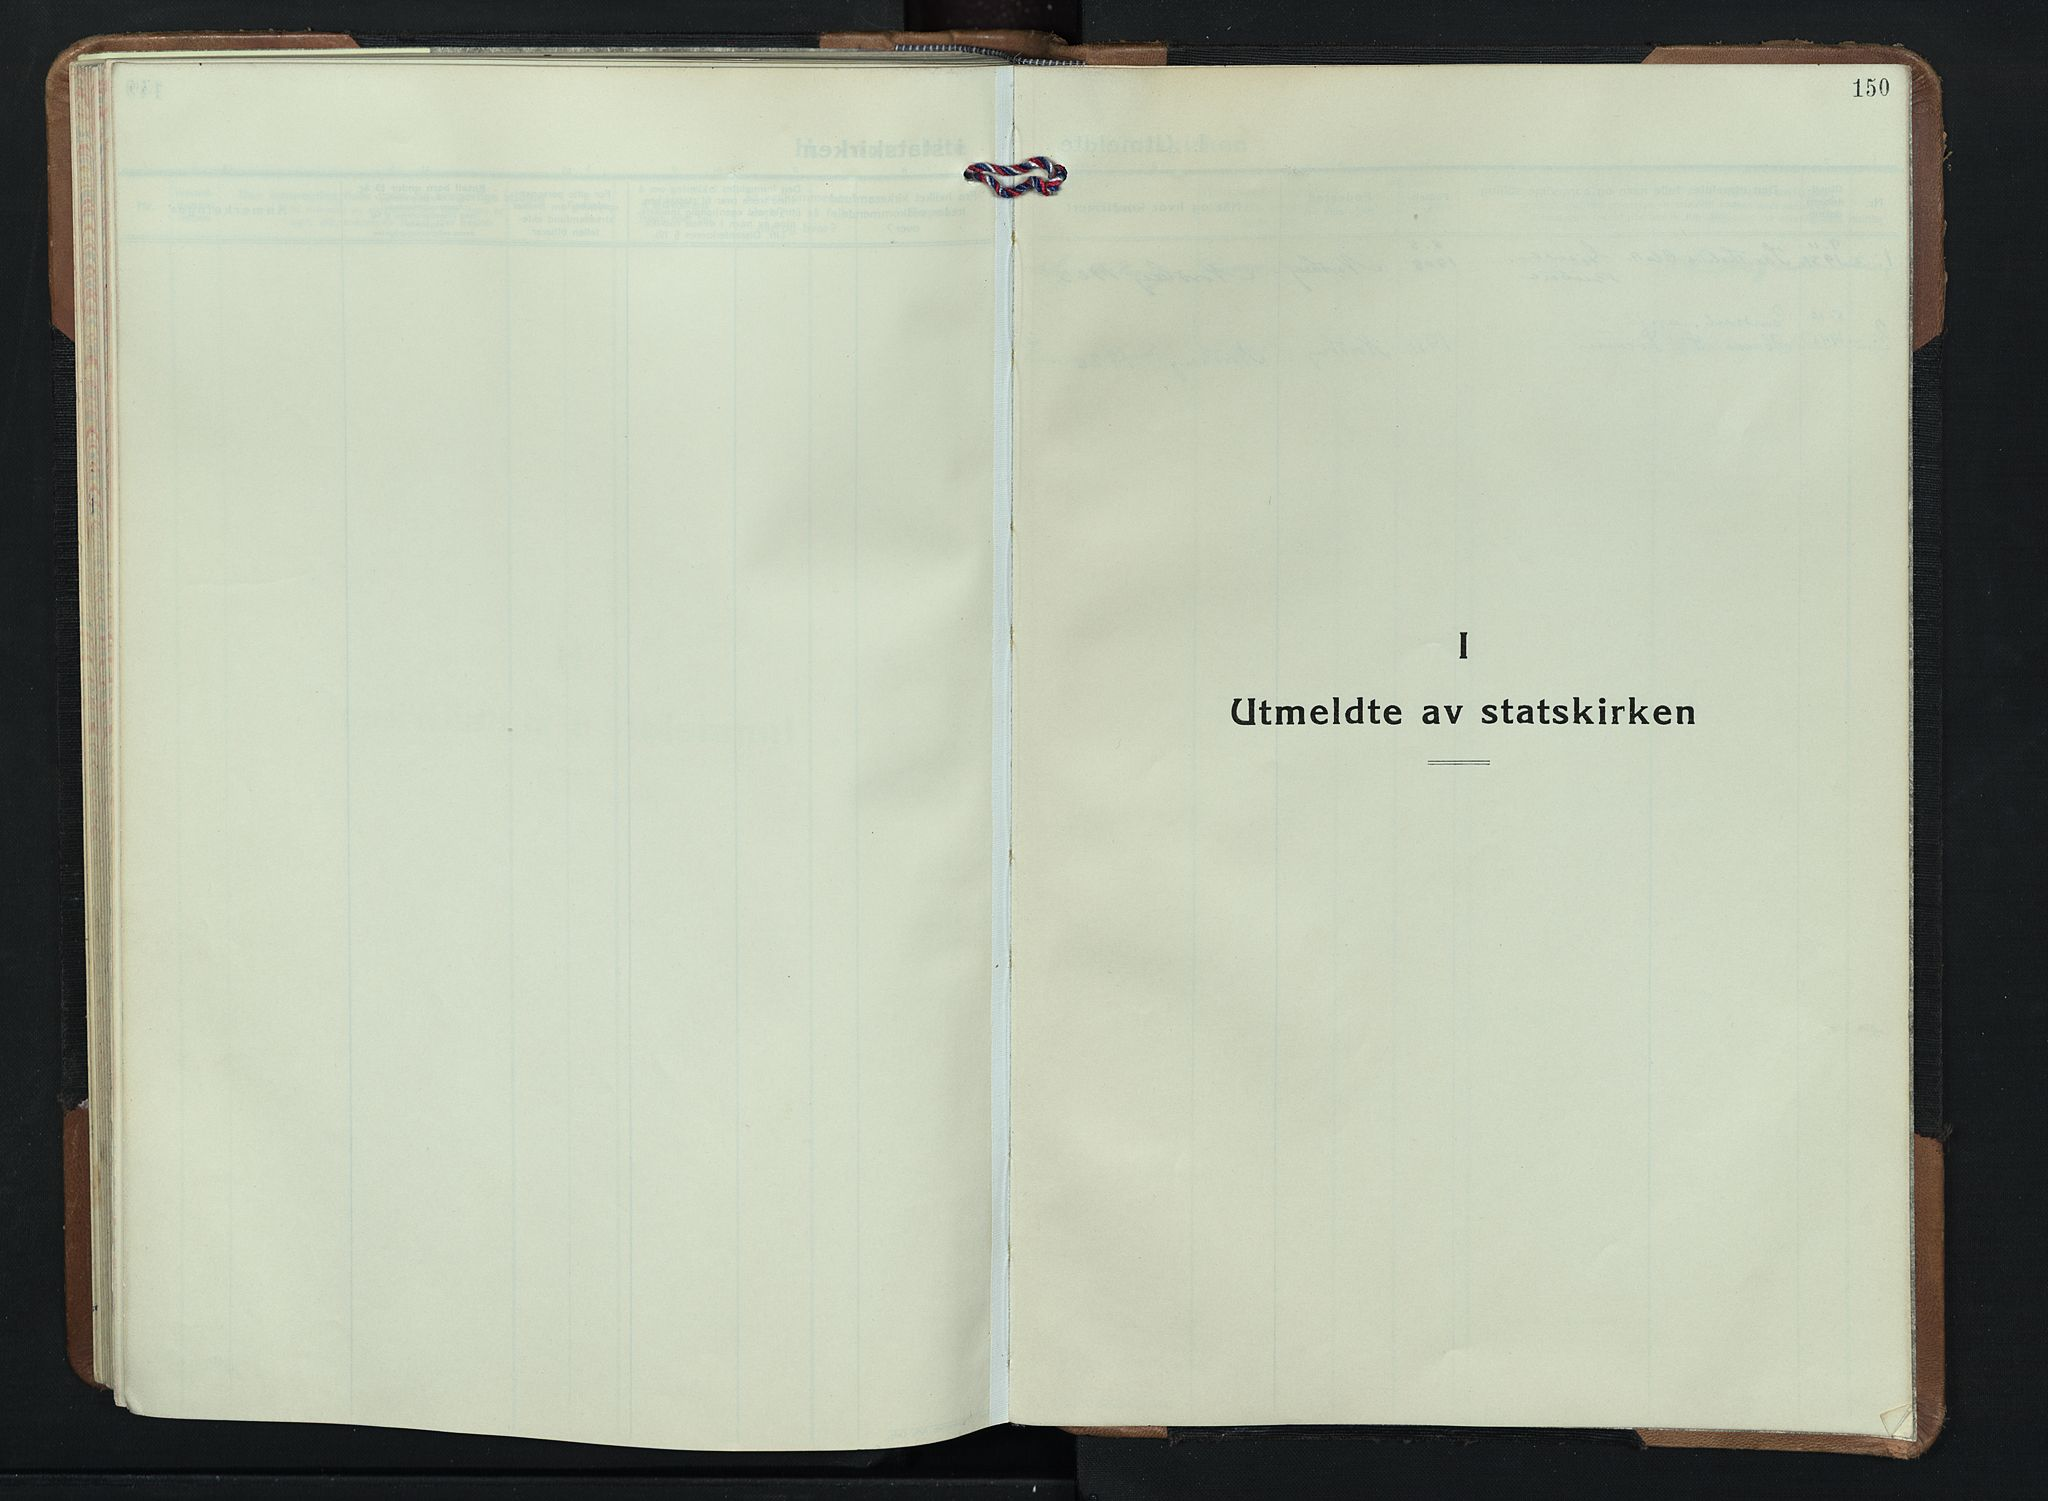 SAH, Skjåk prestekontor, Klokkerbok nr. 7, 1936-1958, s. 150